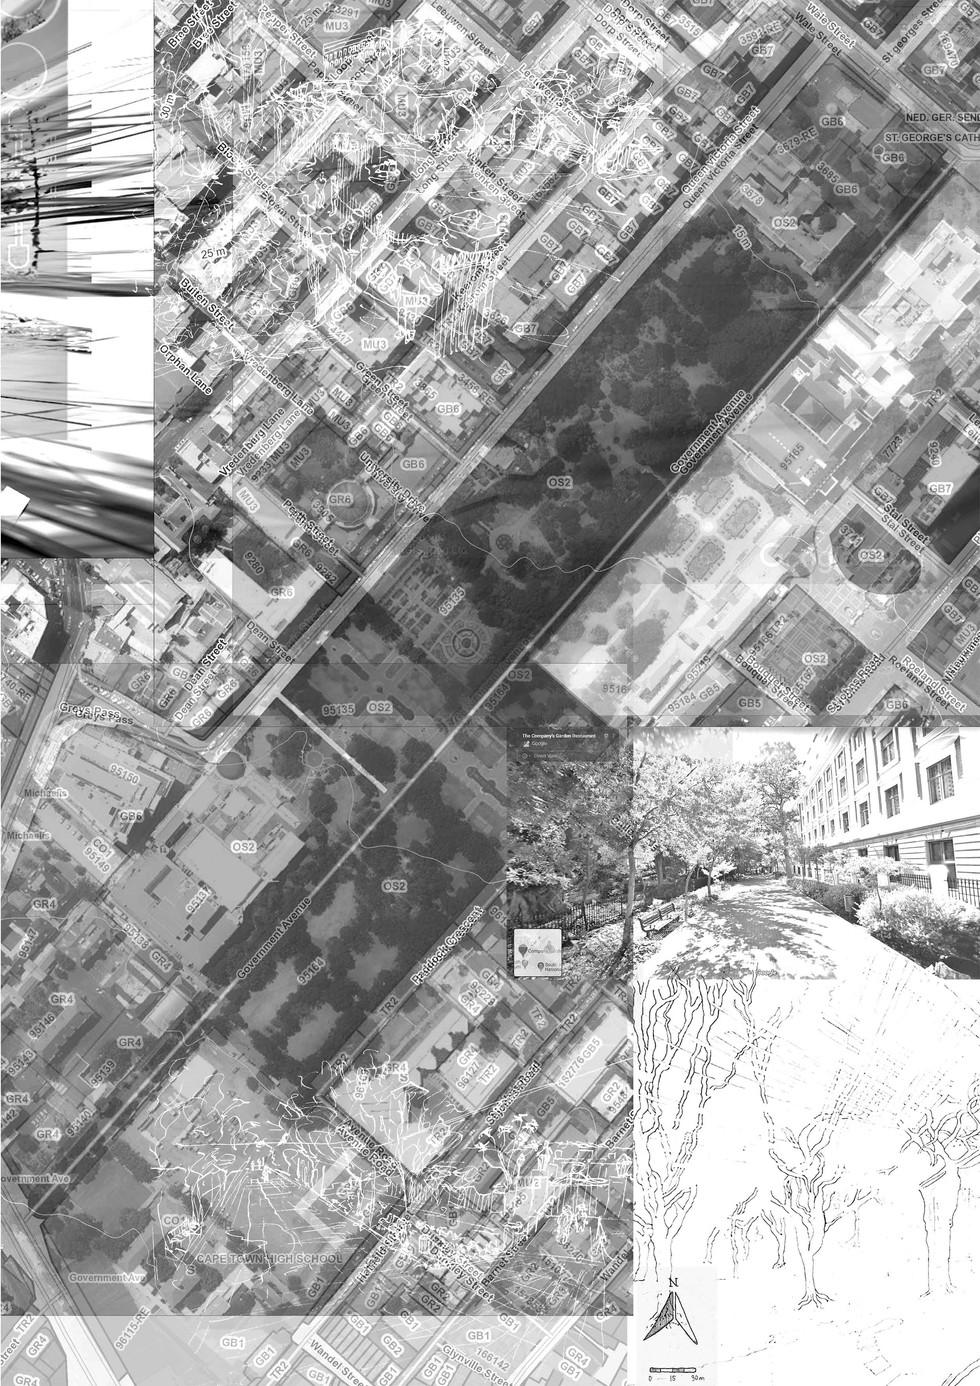 Land Use Compression of Company's Garden. Servant, AT. Unit 13. 2020.